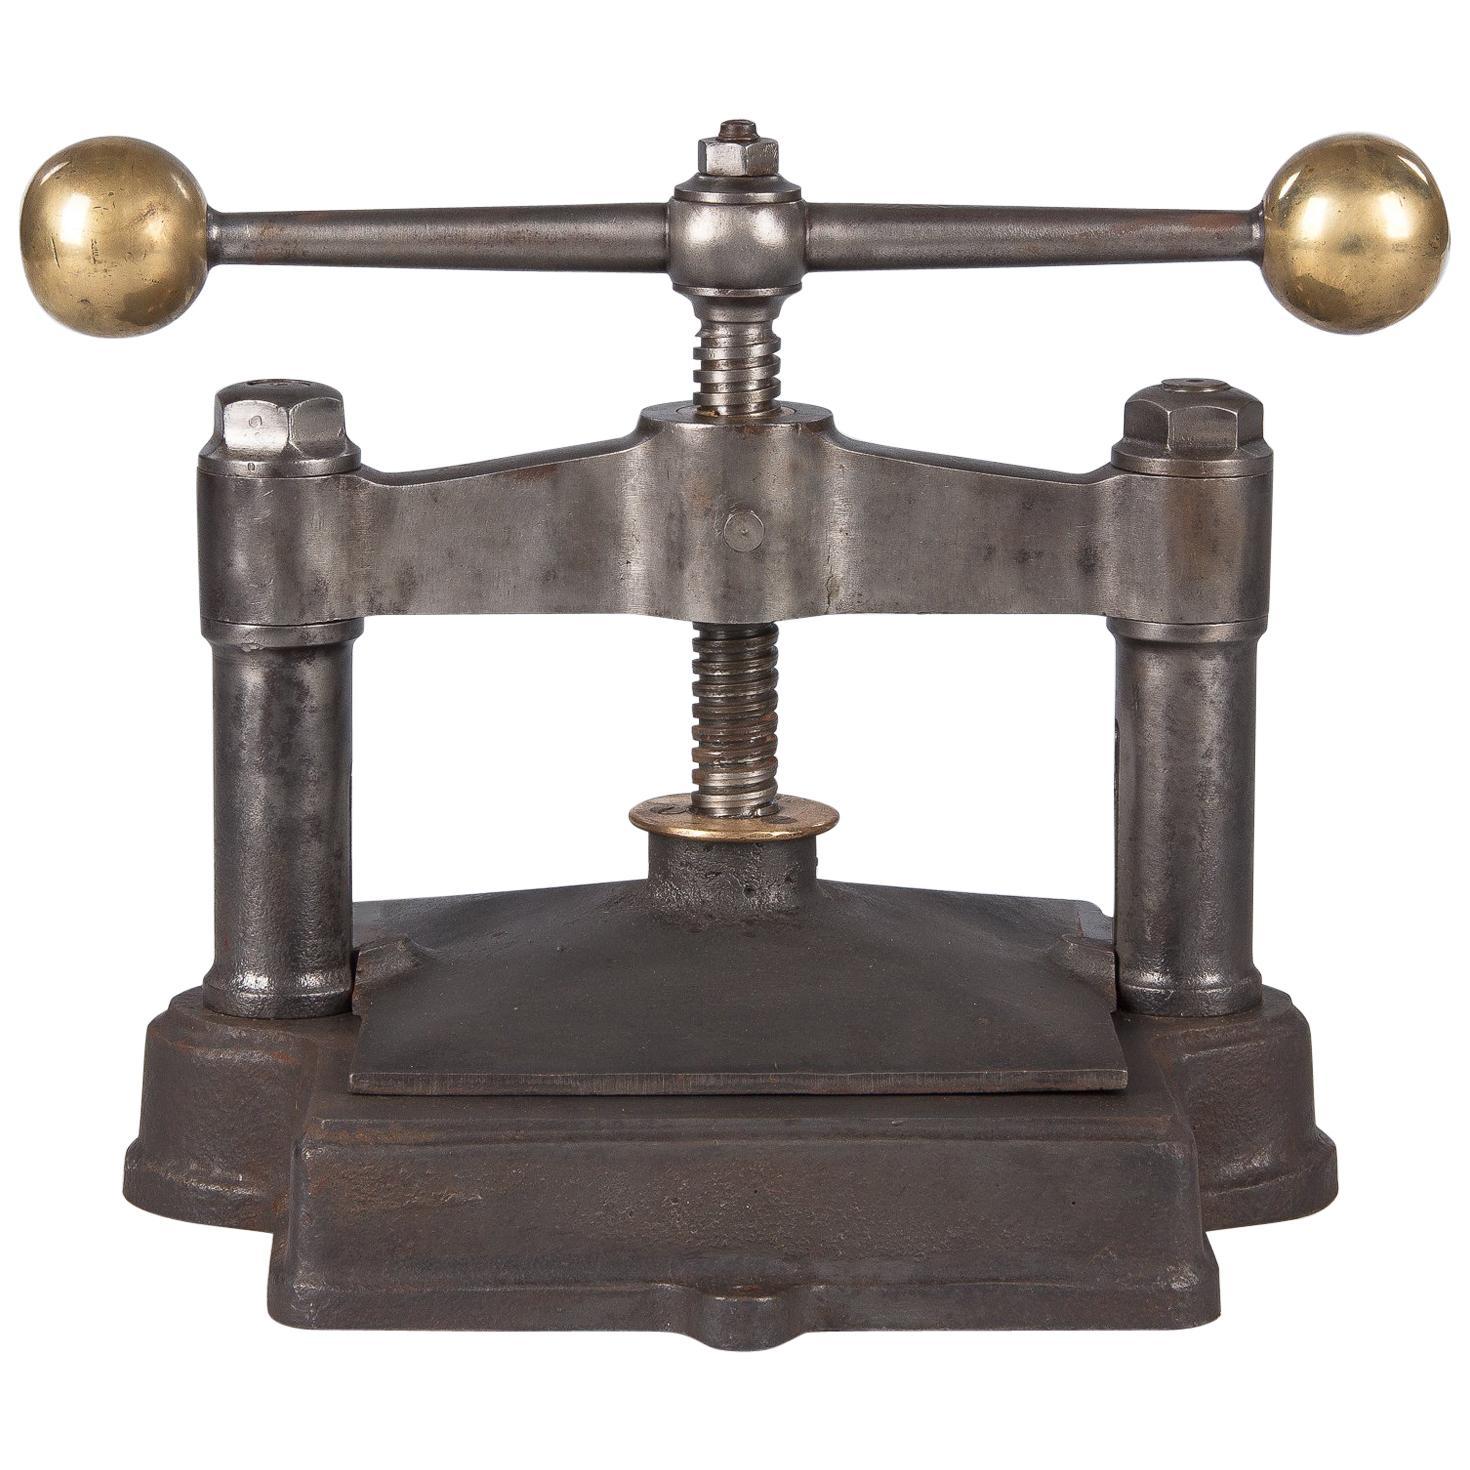 Antique Iron Press Machine